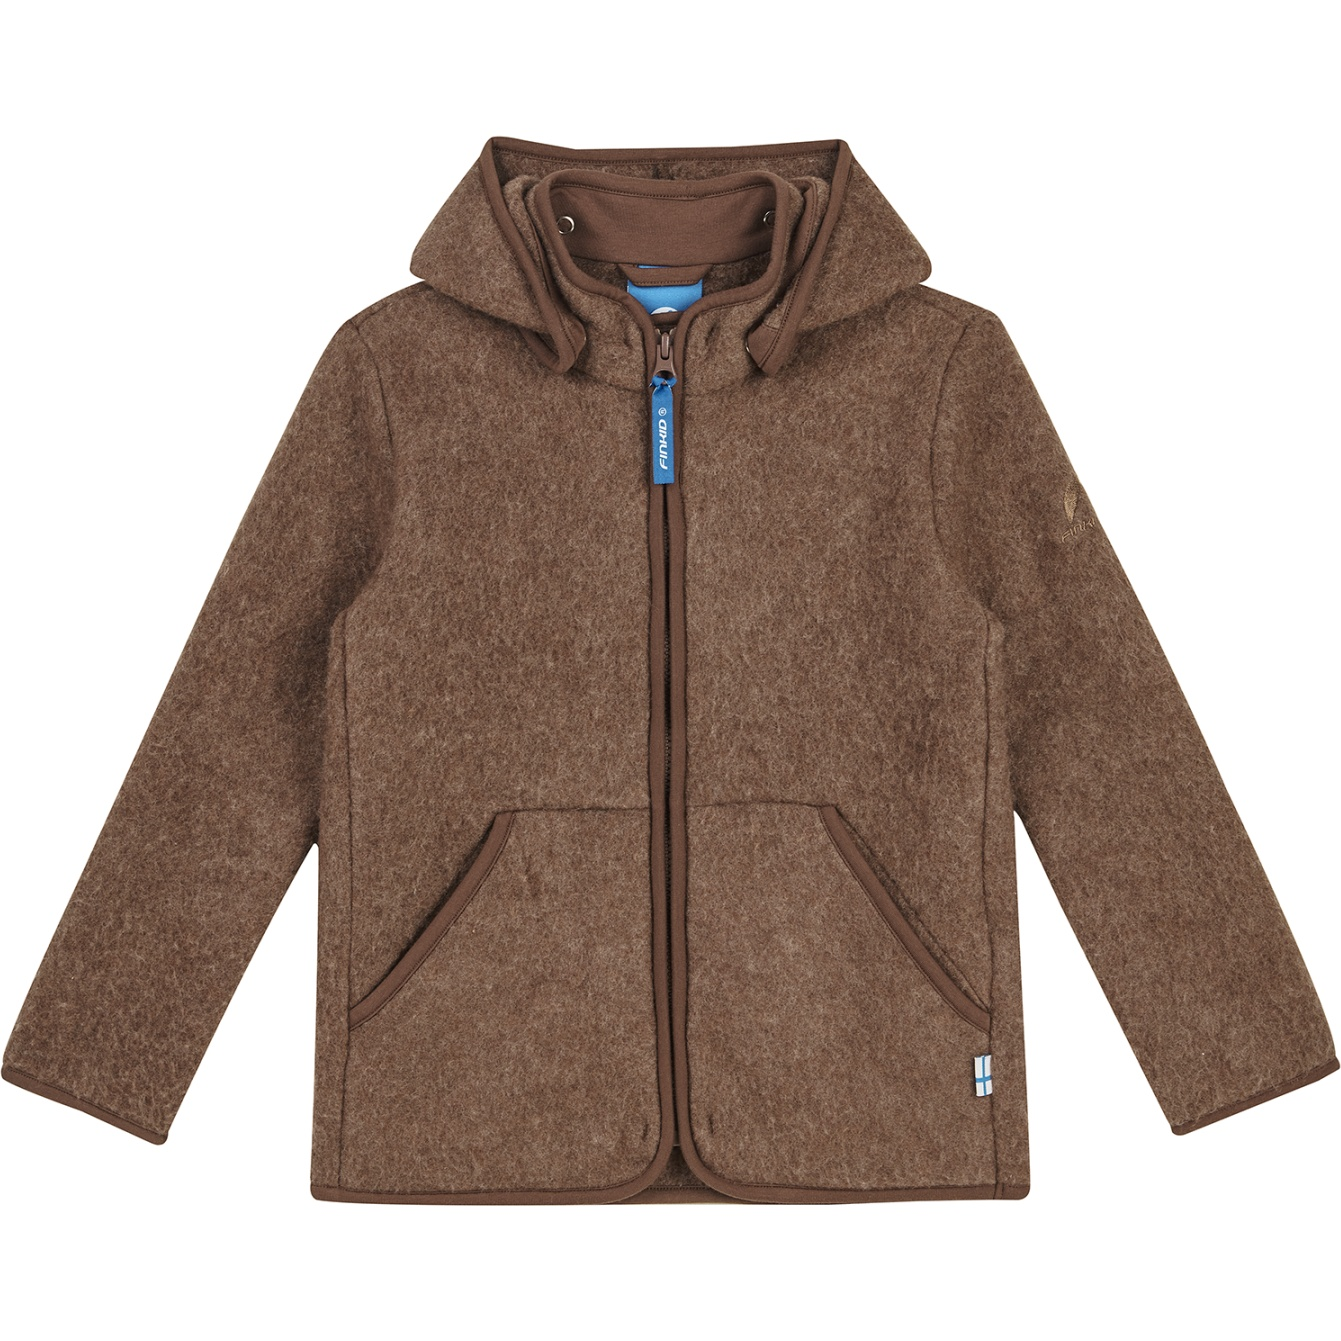 Finkid LUONTO WOOL Zip In Inner Jacket - Kids Wool Fleece Jacket - cocoa